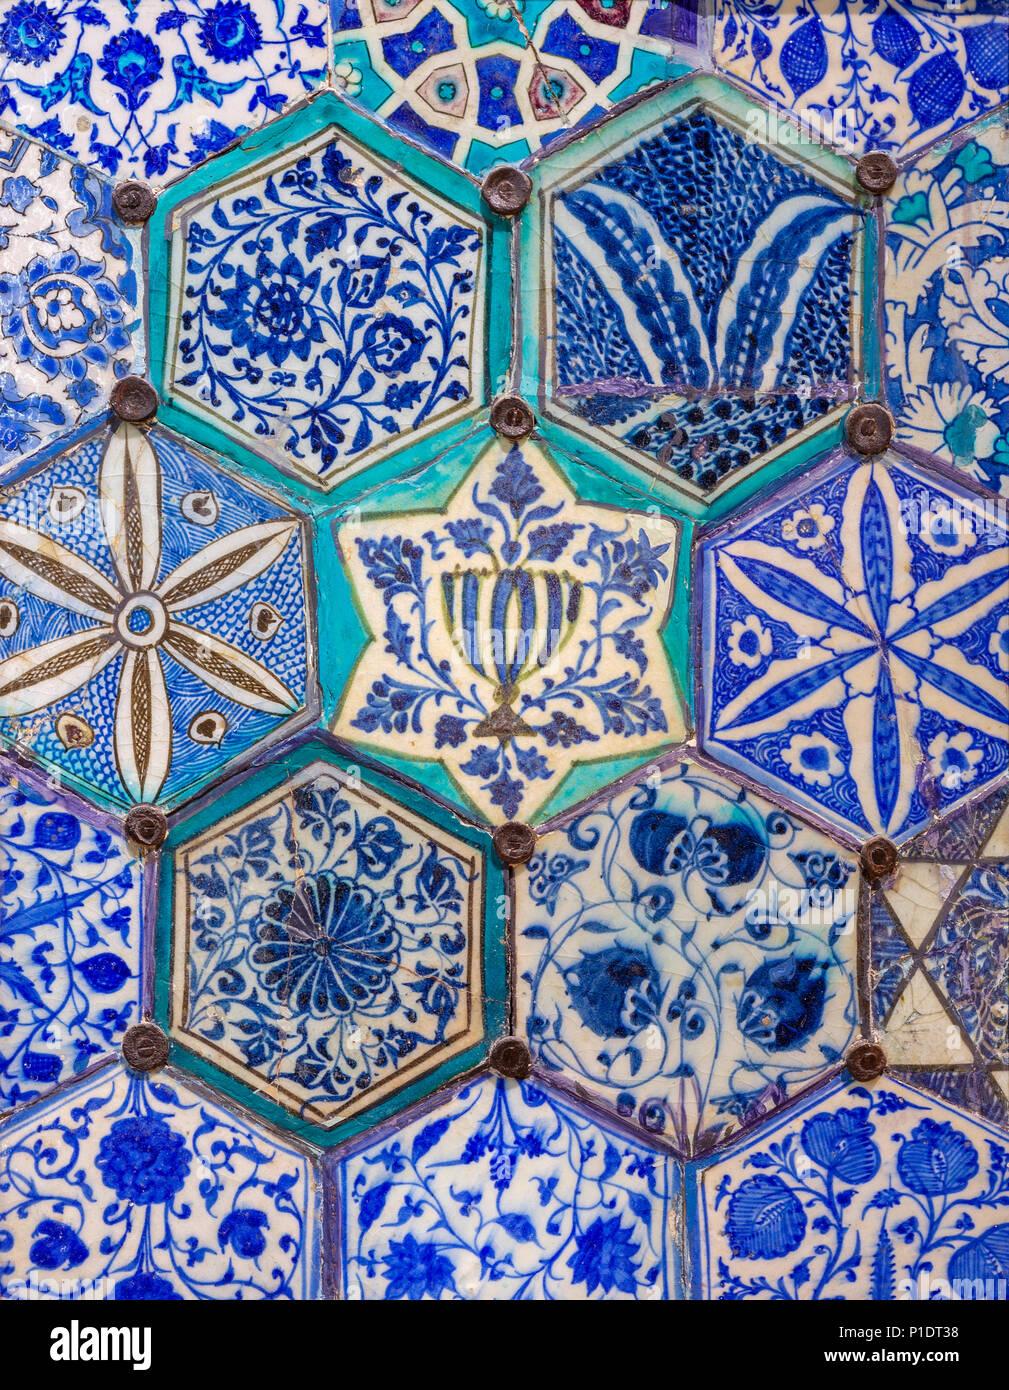 Mamluk era glazed ceramic tiles decorated with floral ornamentations, Public fountain of Qaitbay, Cairo, Egypt - Stock Image